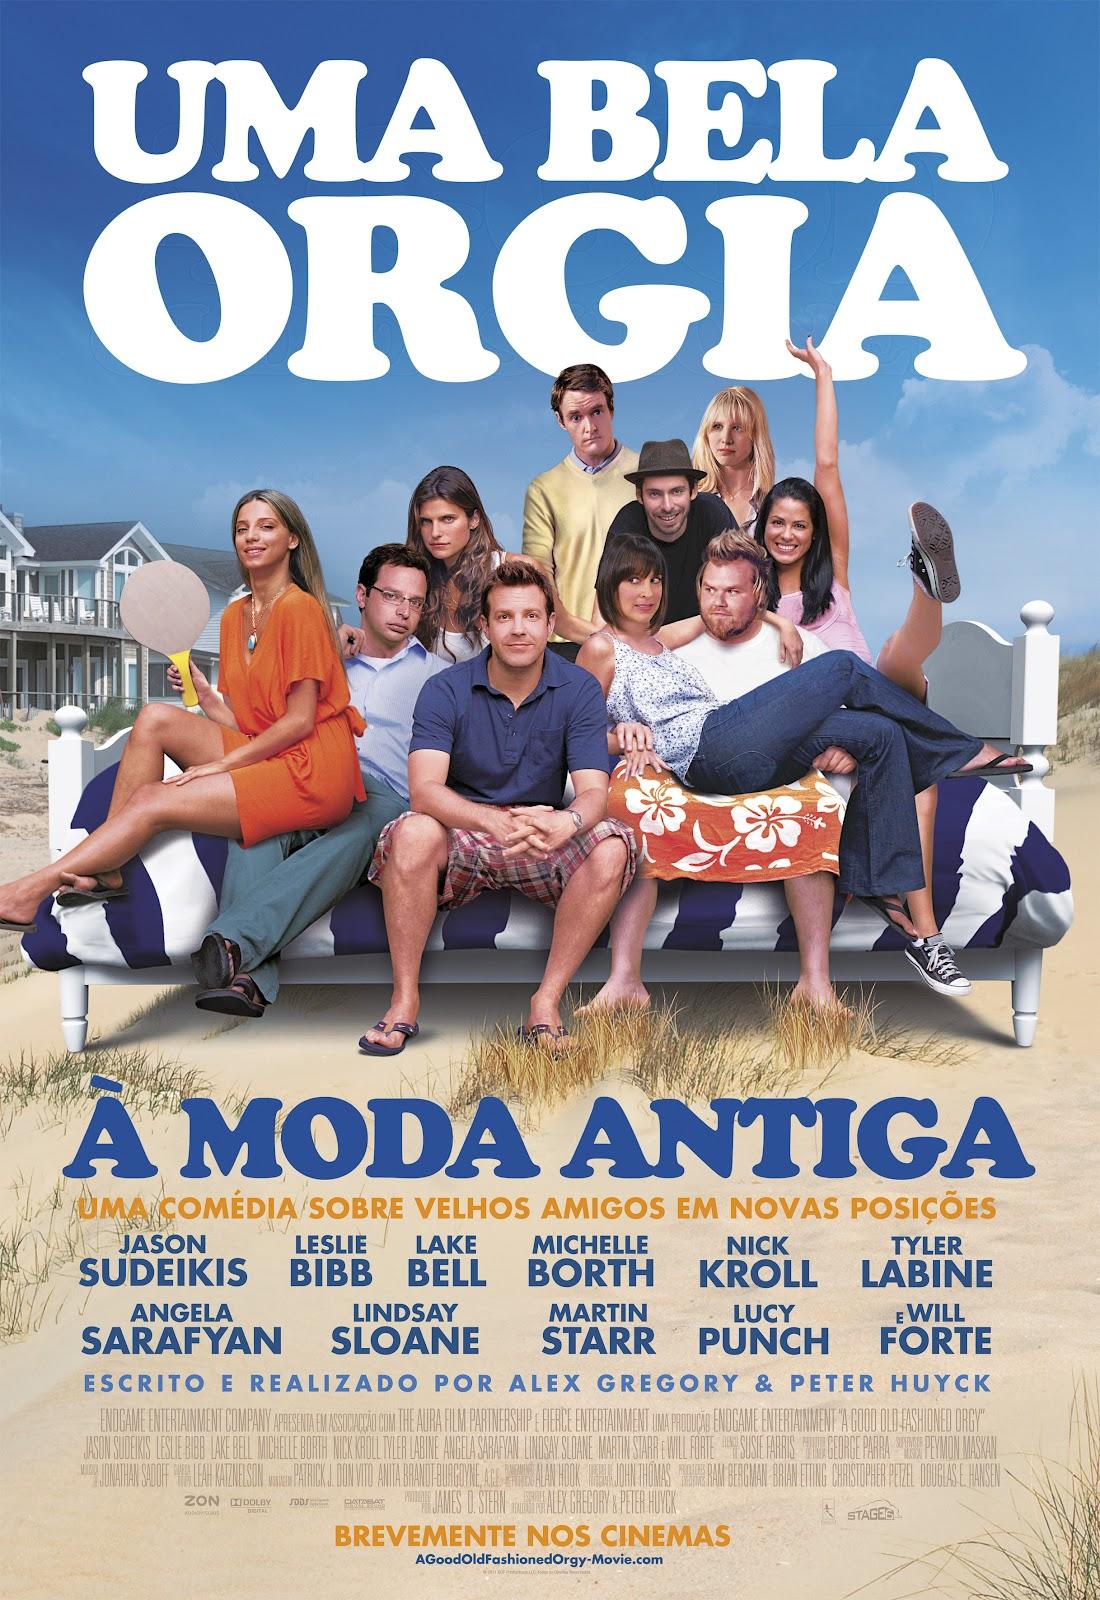 http://3.bp.blogspot.com/-lN_eDZ5j_lM/T-GwLrwJVRI/AAAAAAAAHeU/eV2FEJdZEVQ/s1600/POSTER+CINEMA+uma+bela+orgia+a+moda+antiga.jpg